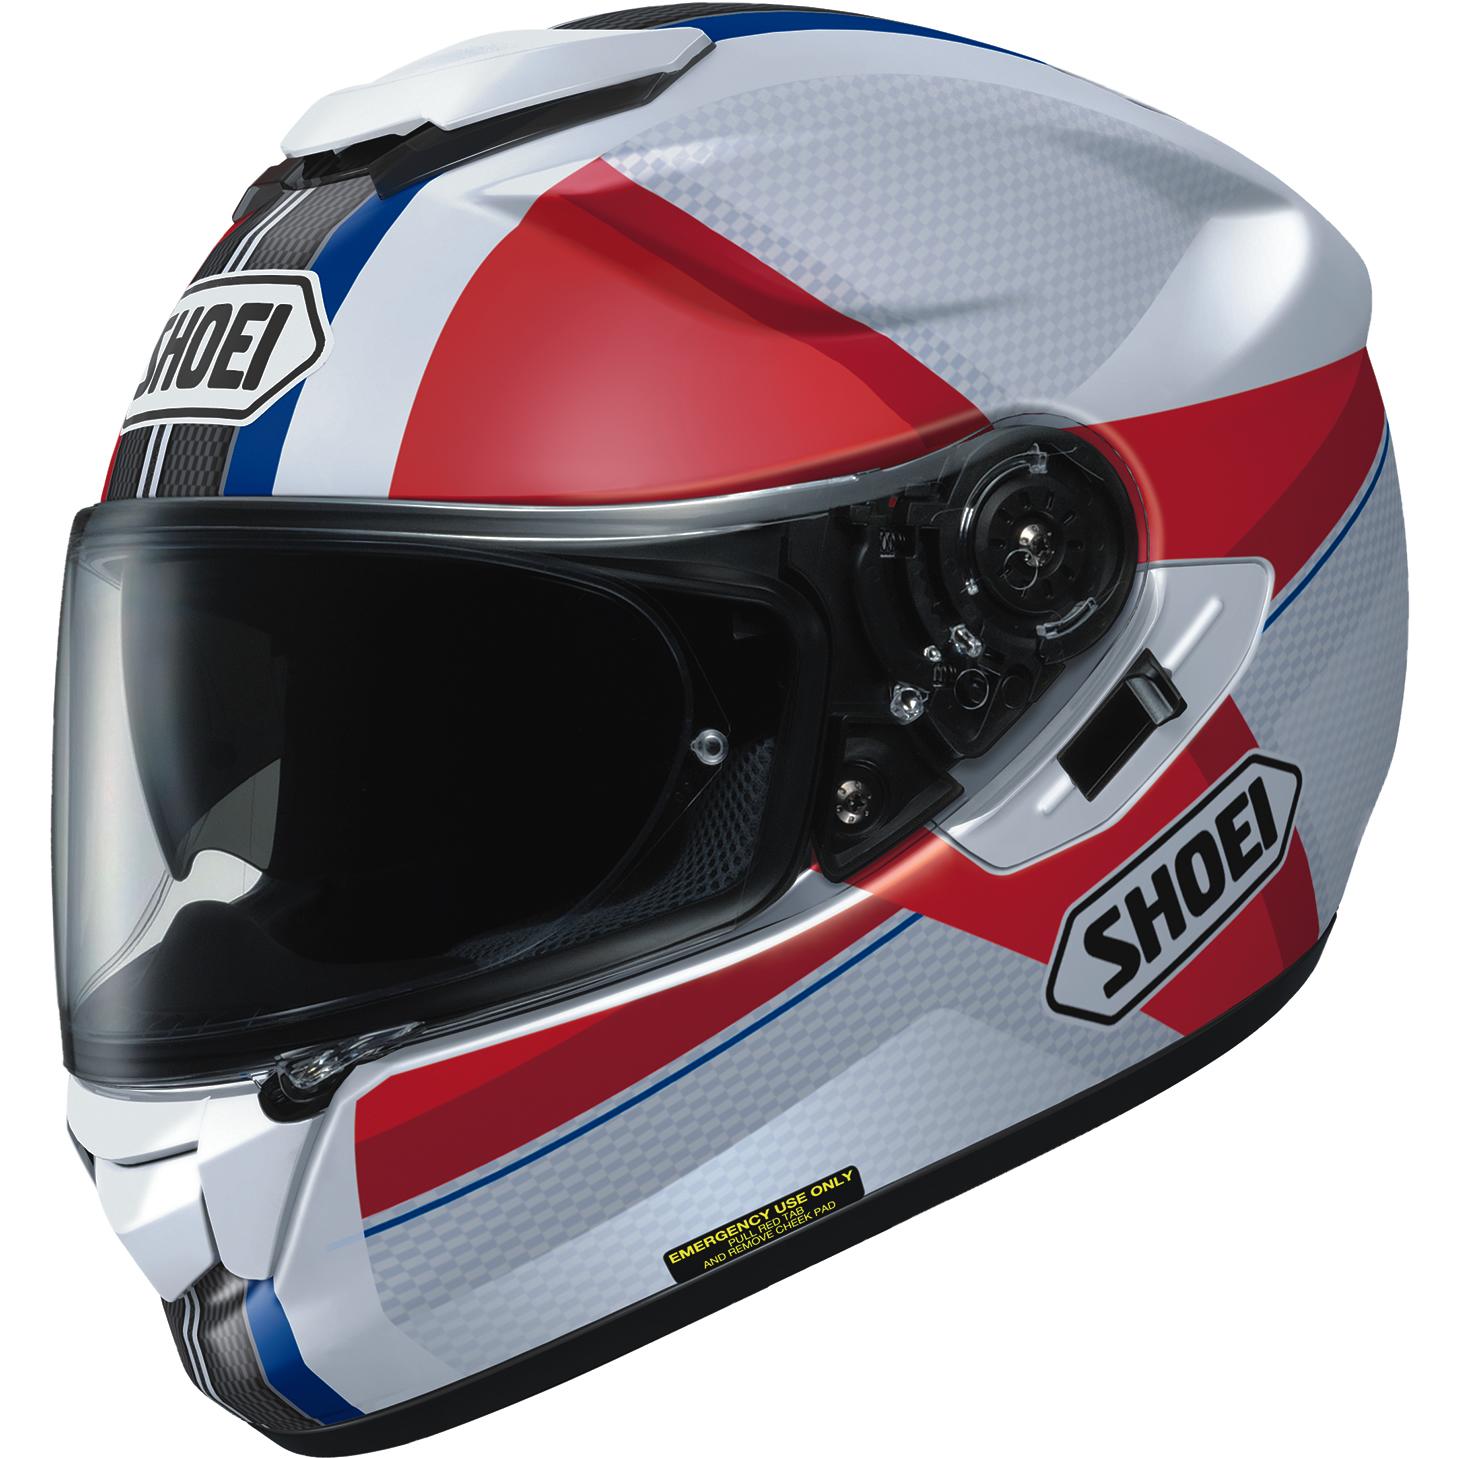 shoei gt air exposure matt black motorcycle helmet tc 10 white blue red dd ring ebay. Black Bedroom Furniture Sets. Home Design Ideas